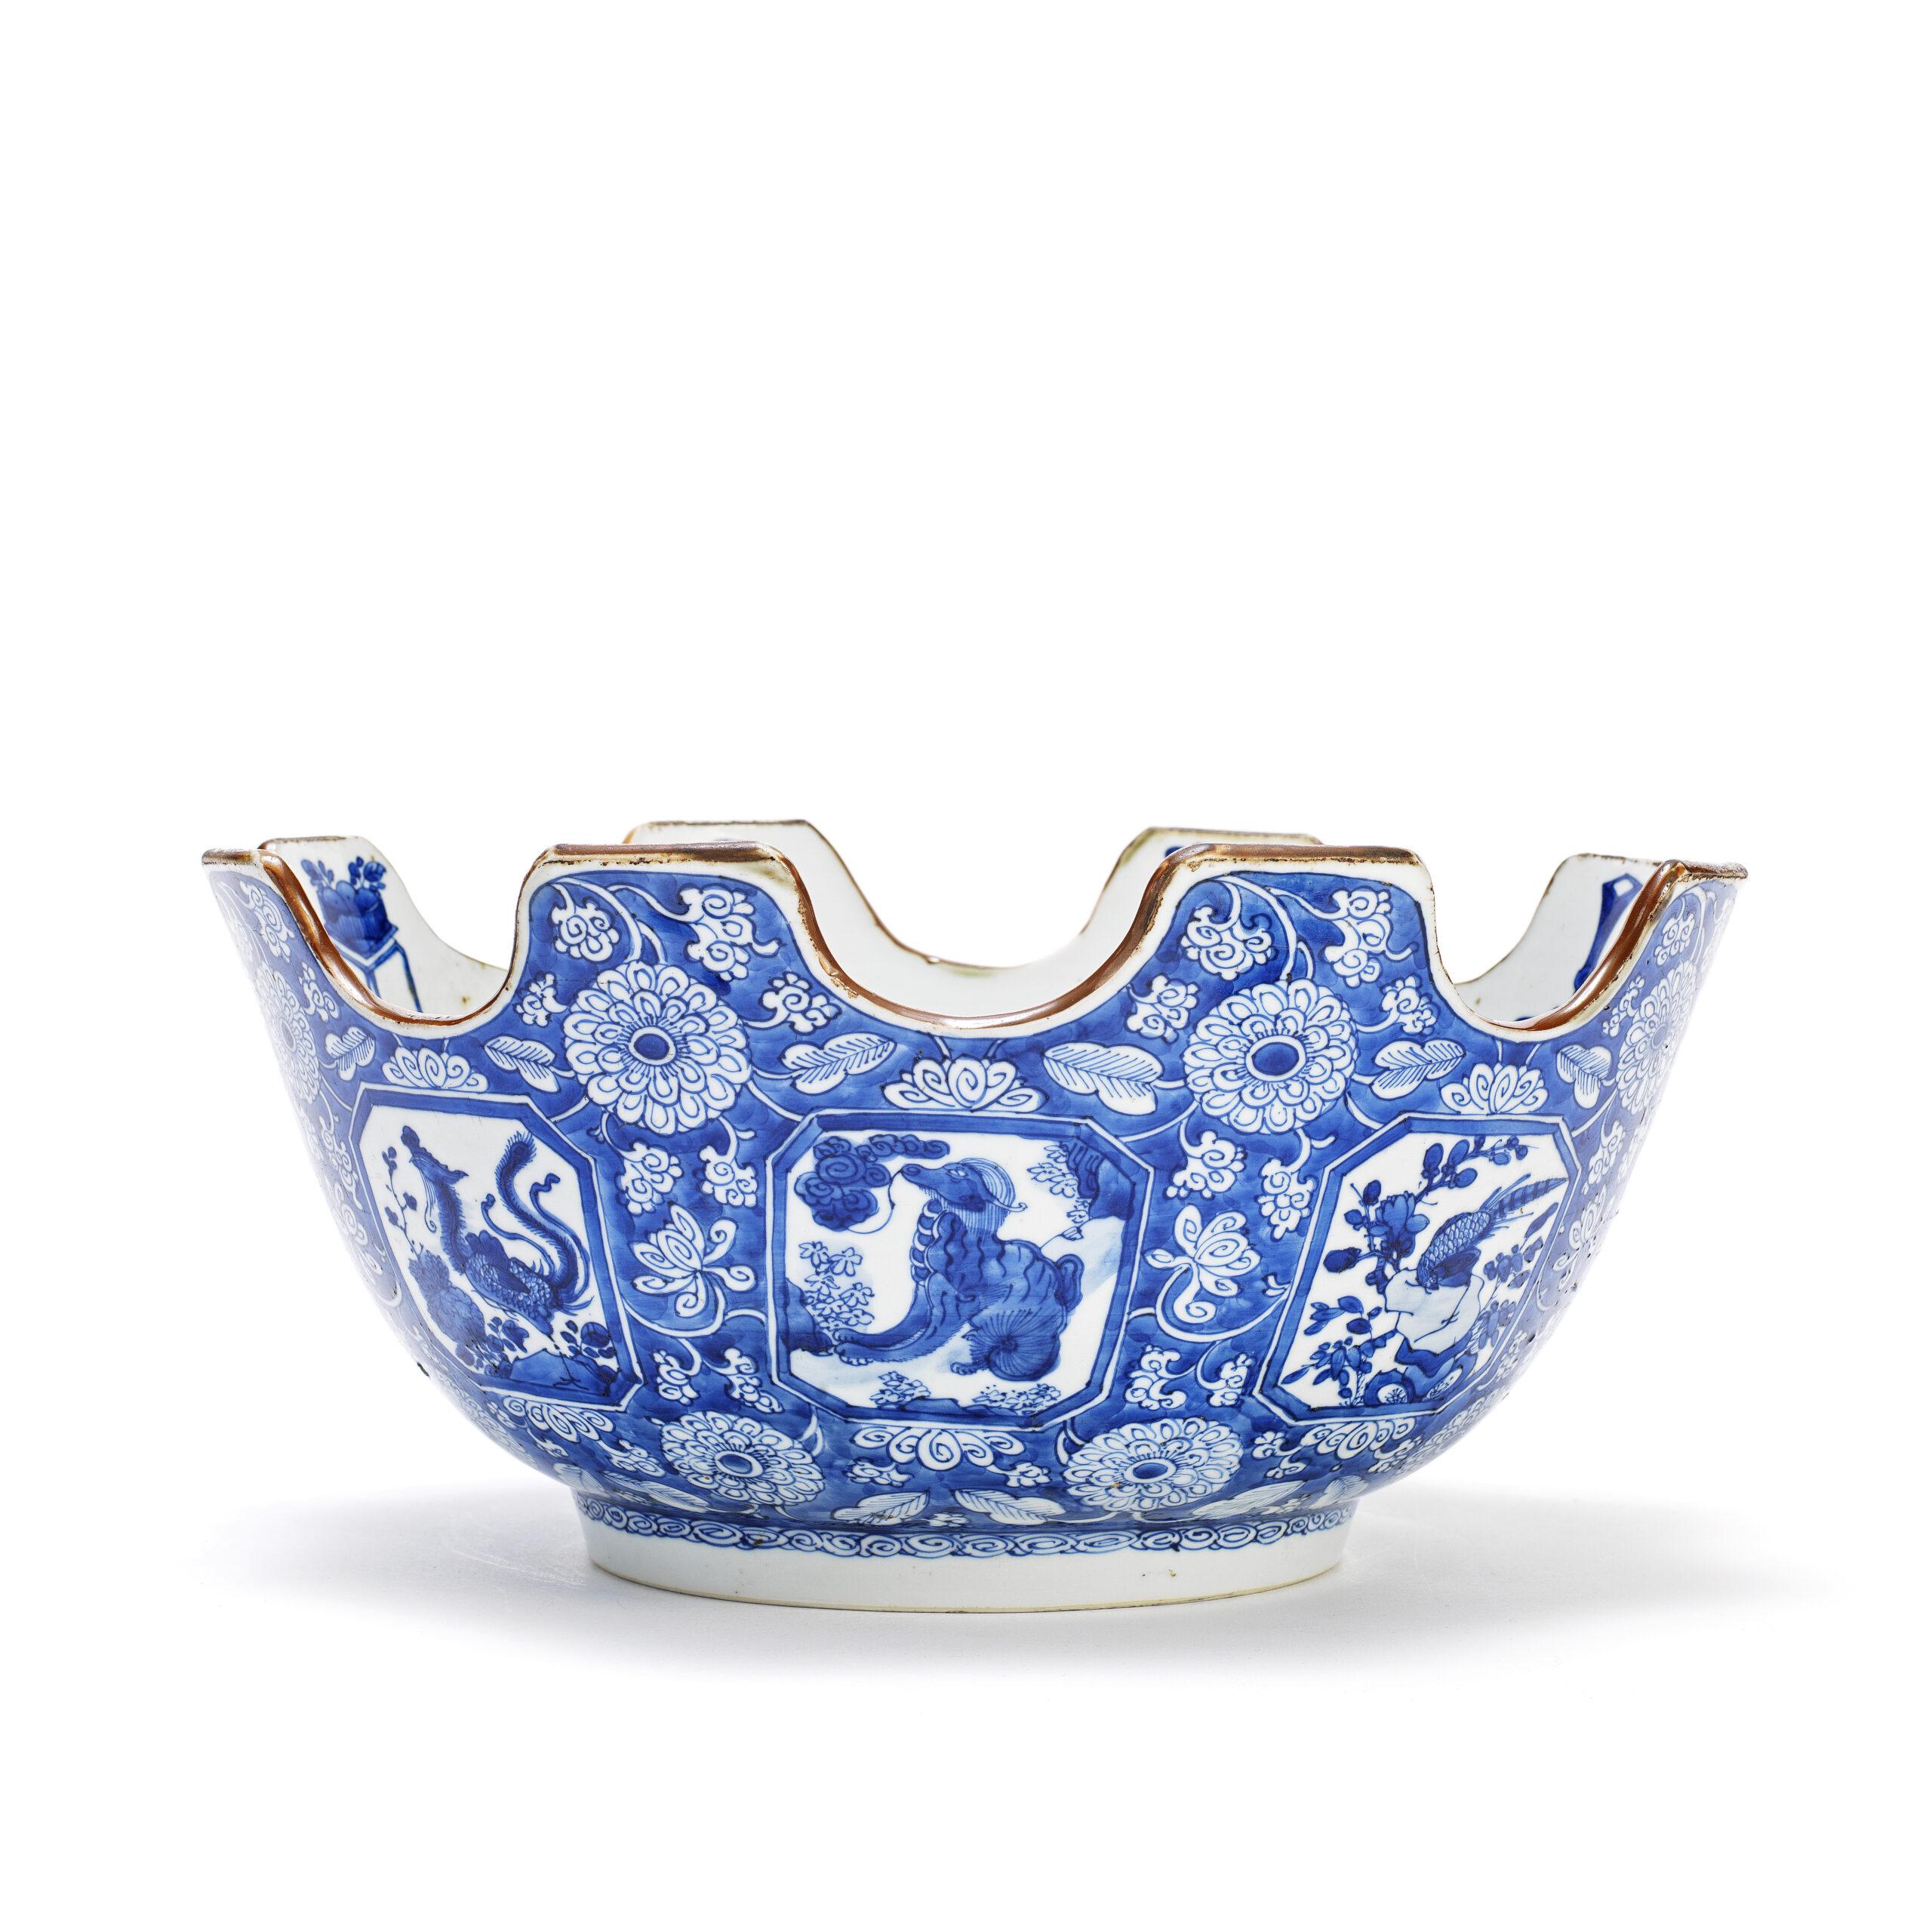 A RARE BLUE AND WHITE MONTEITH, Kangxi, c.1700-1715